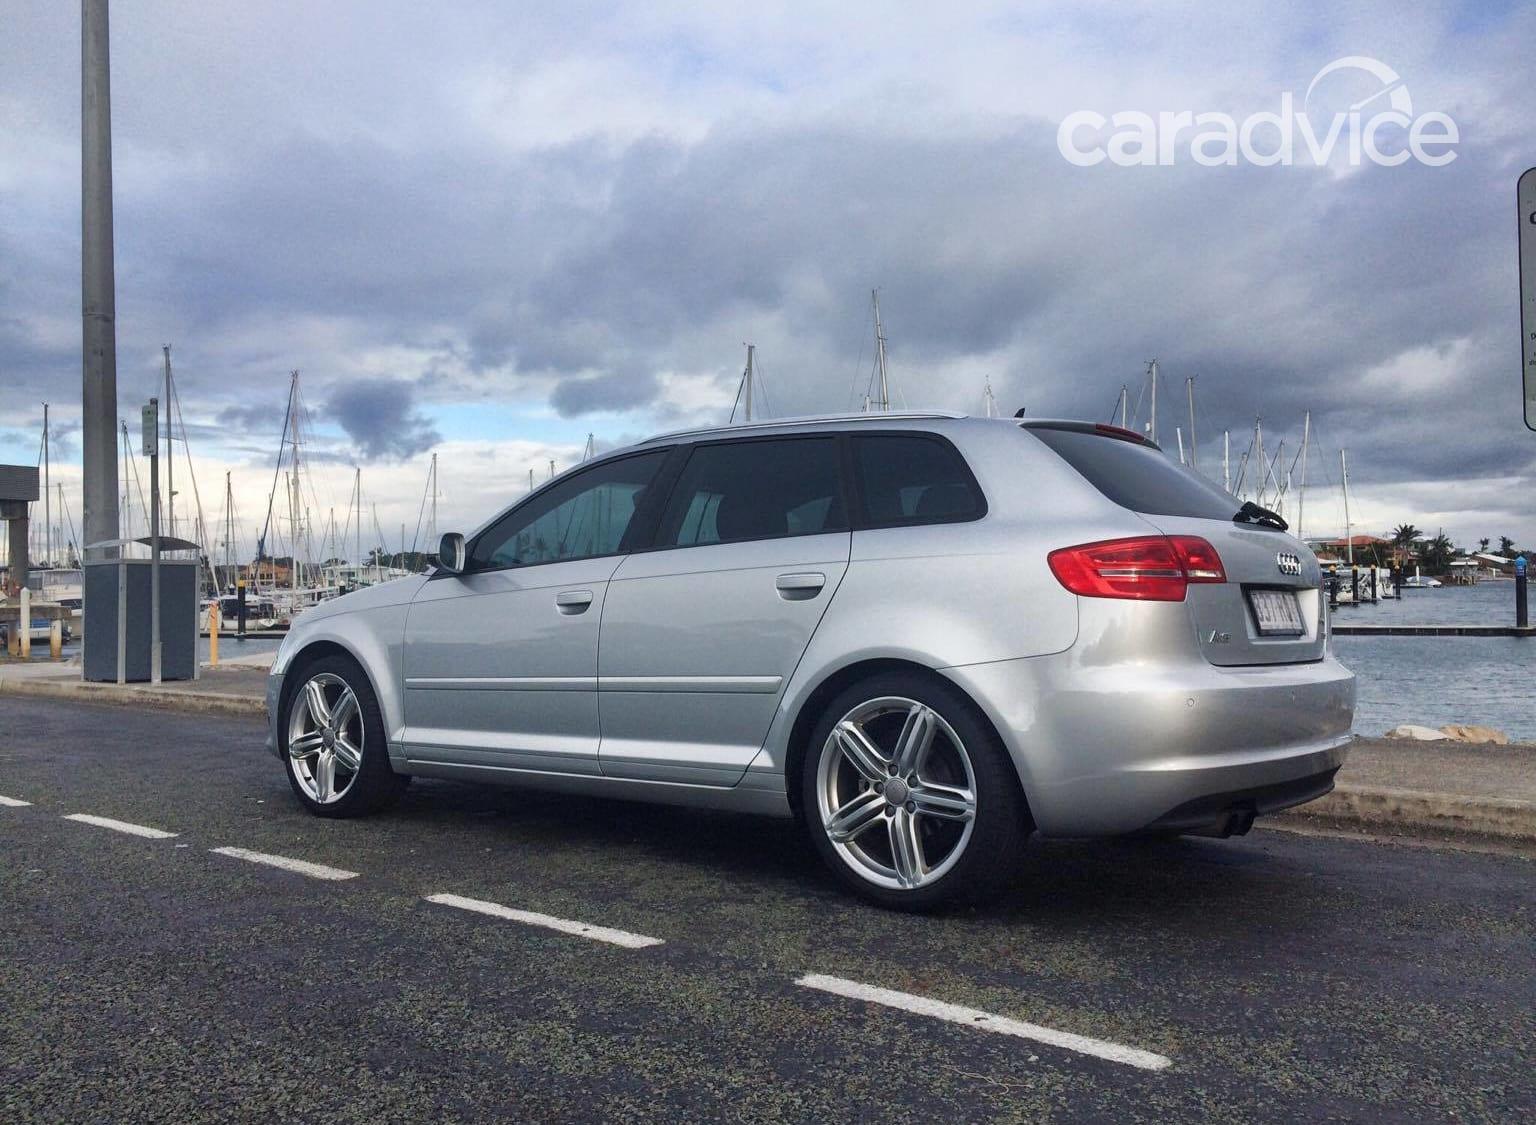 2010 Audi A3 Sportback 1.8 TFSI Ltd Ed Review | CarAdvice